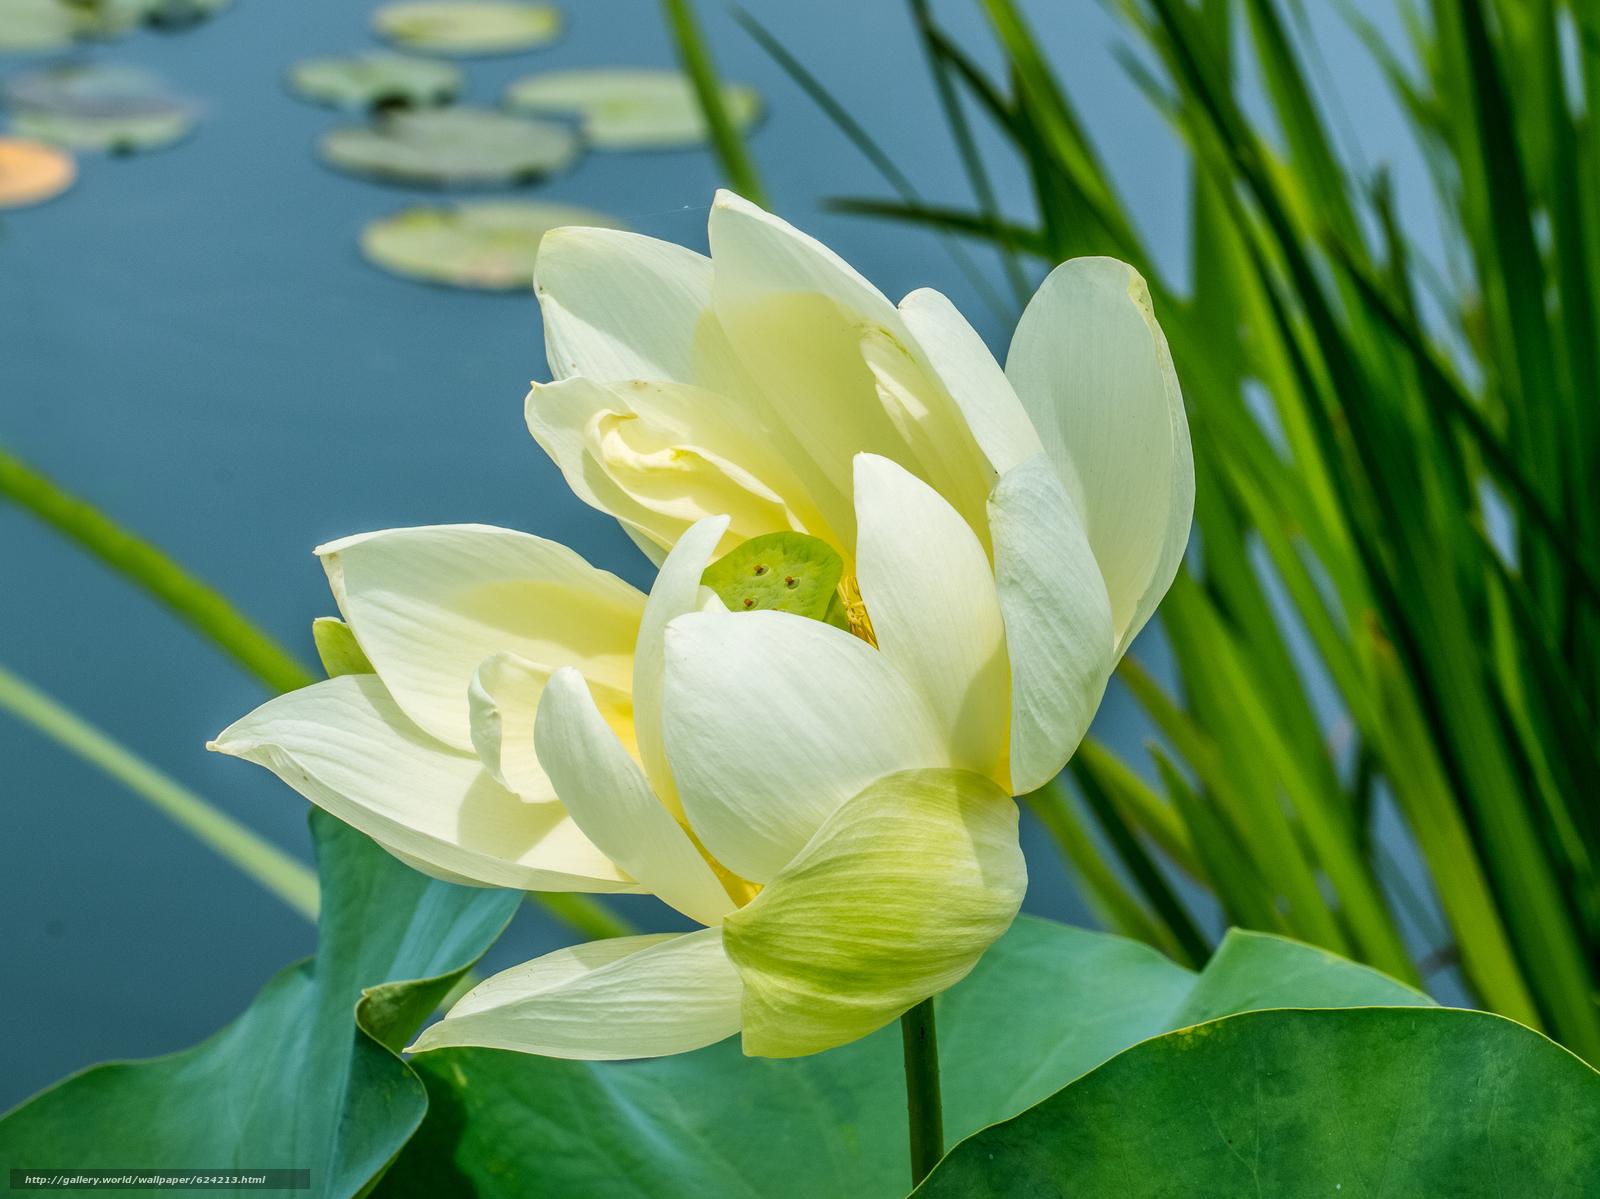 Download wallpaper lotus flower lotus flower free desktop download wallpaper lotus flower lotus flower free desktop wallpaper in the resolution 4715x3533 picture 624213 mightylinksfo